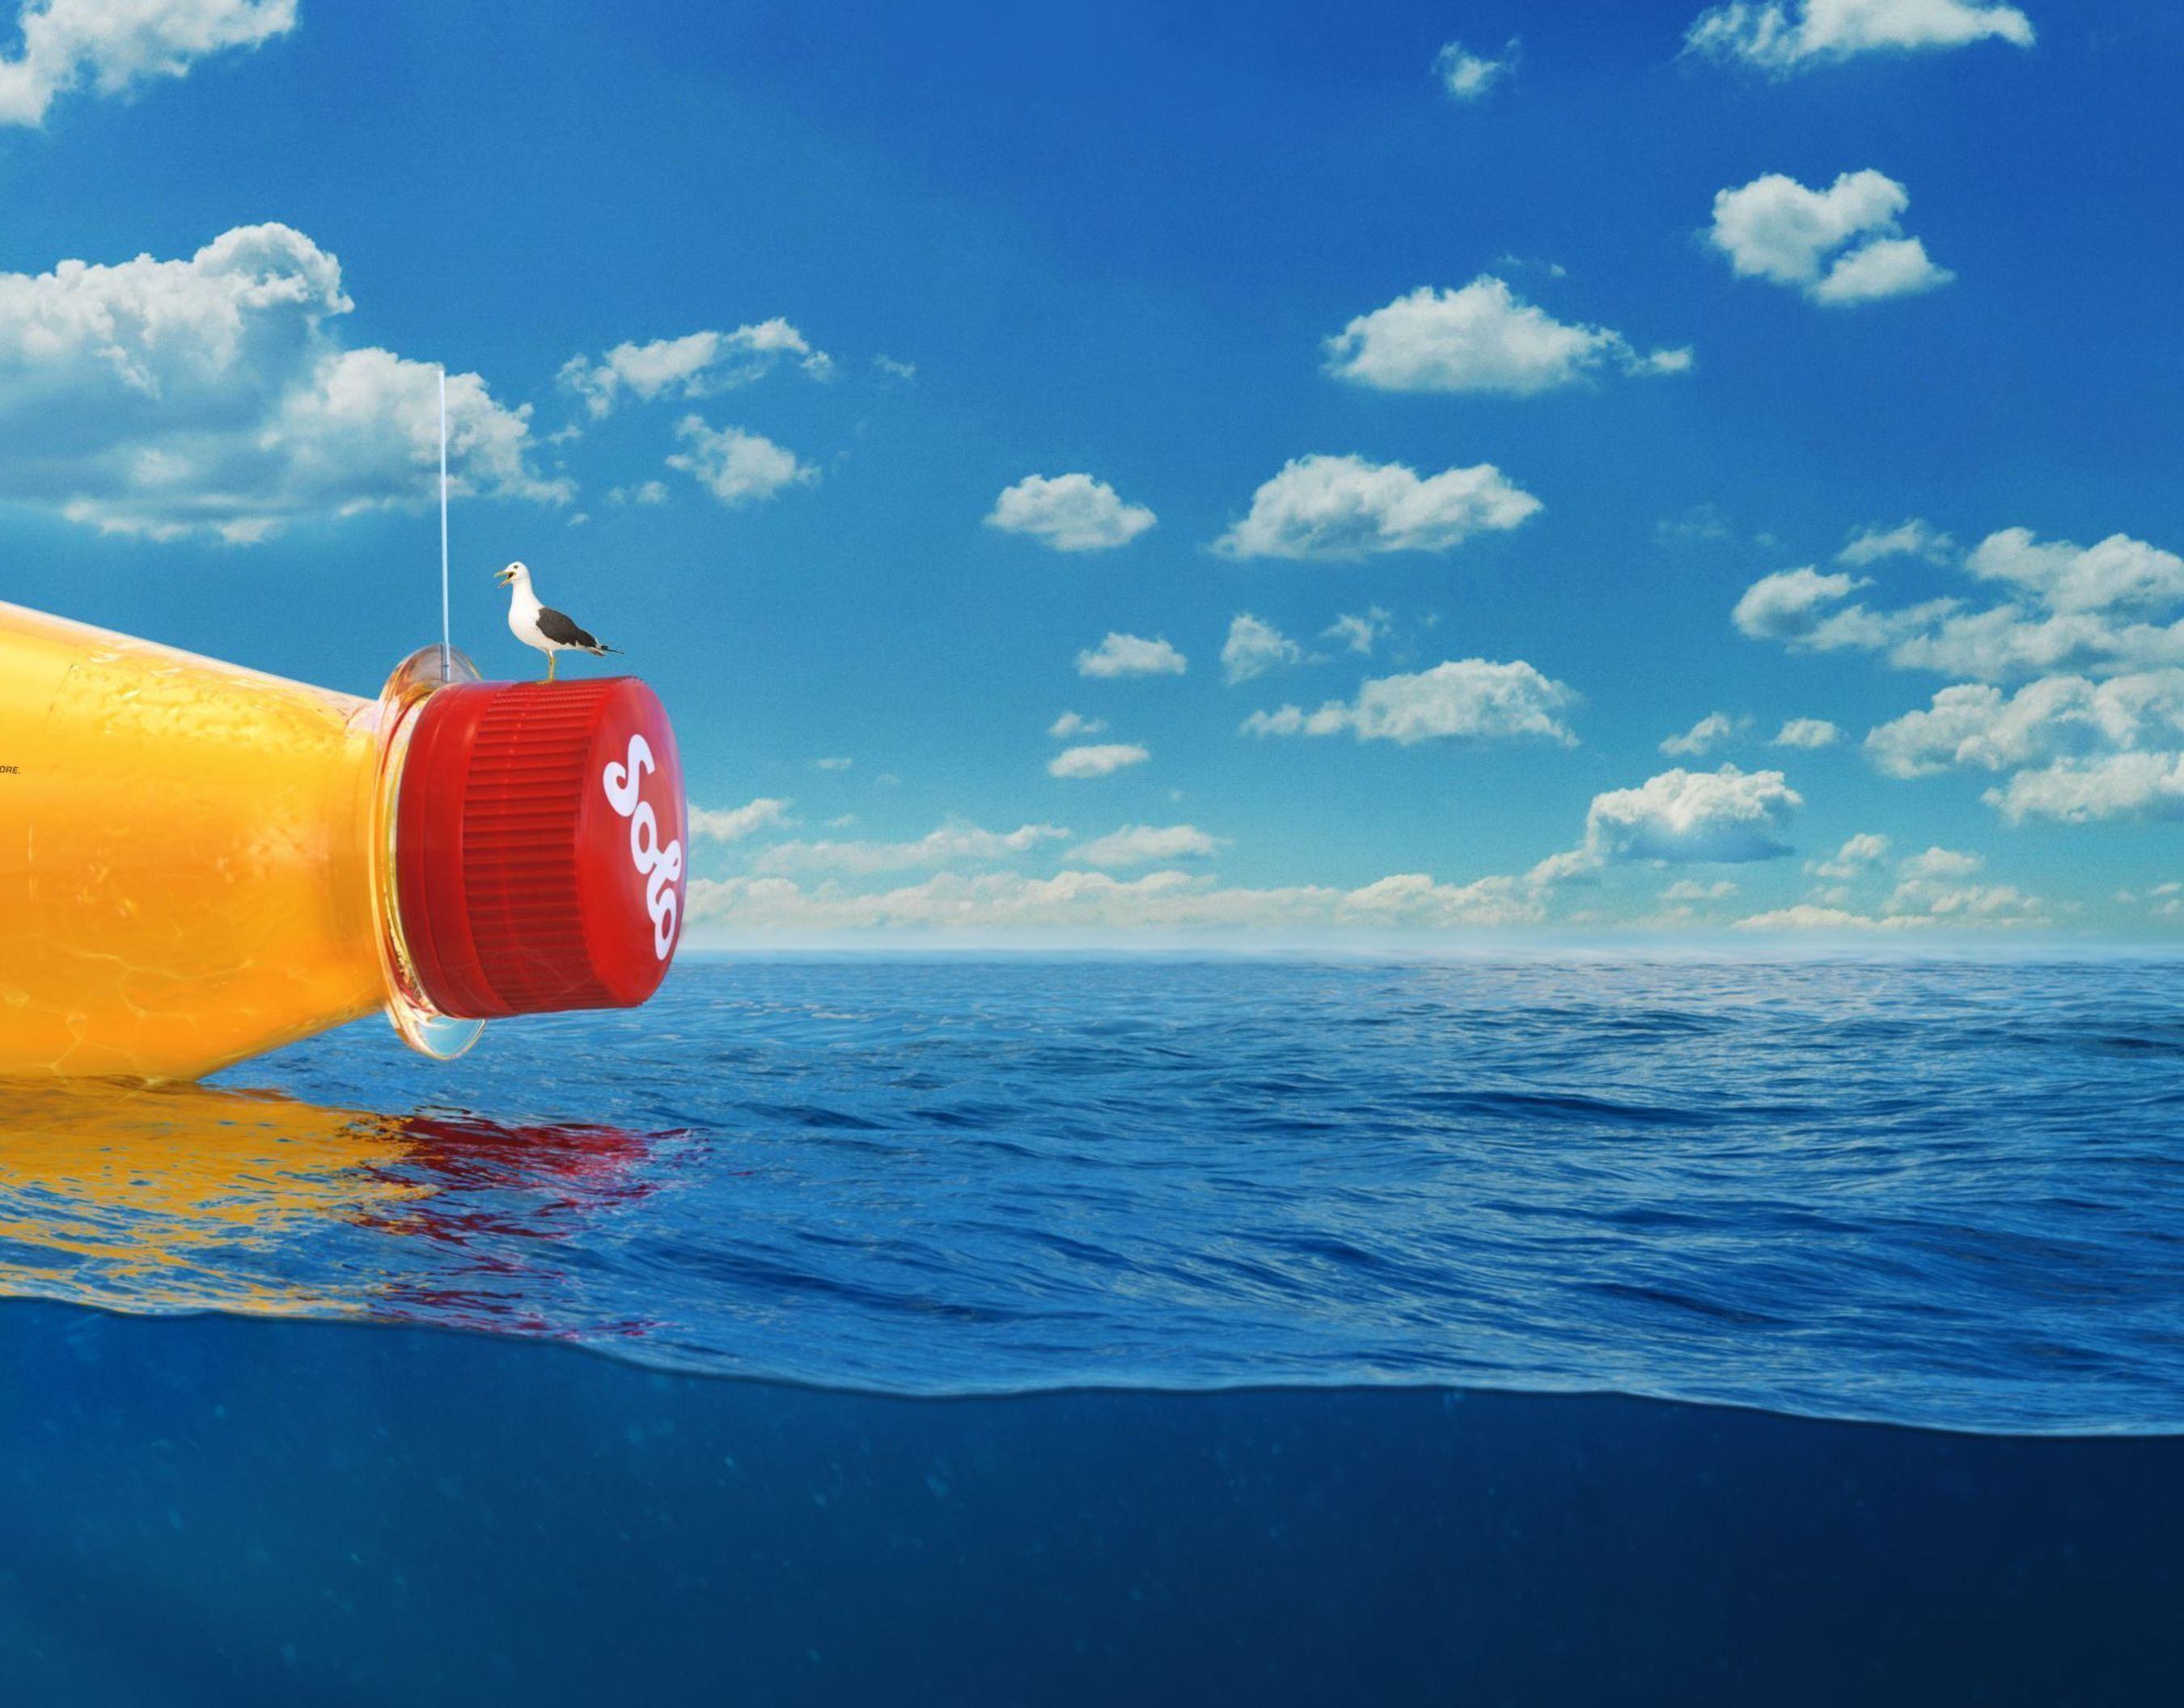 Norwegian soft drink Solo releases world's largest message in a bottle (PRNewsFoto/SOLO)